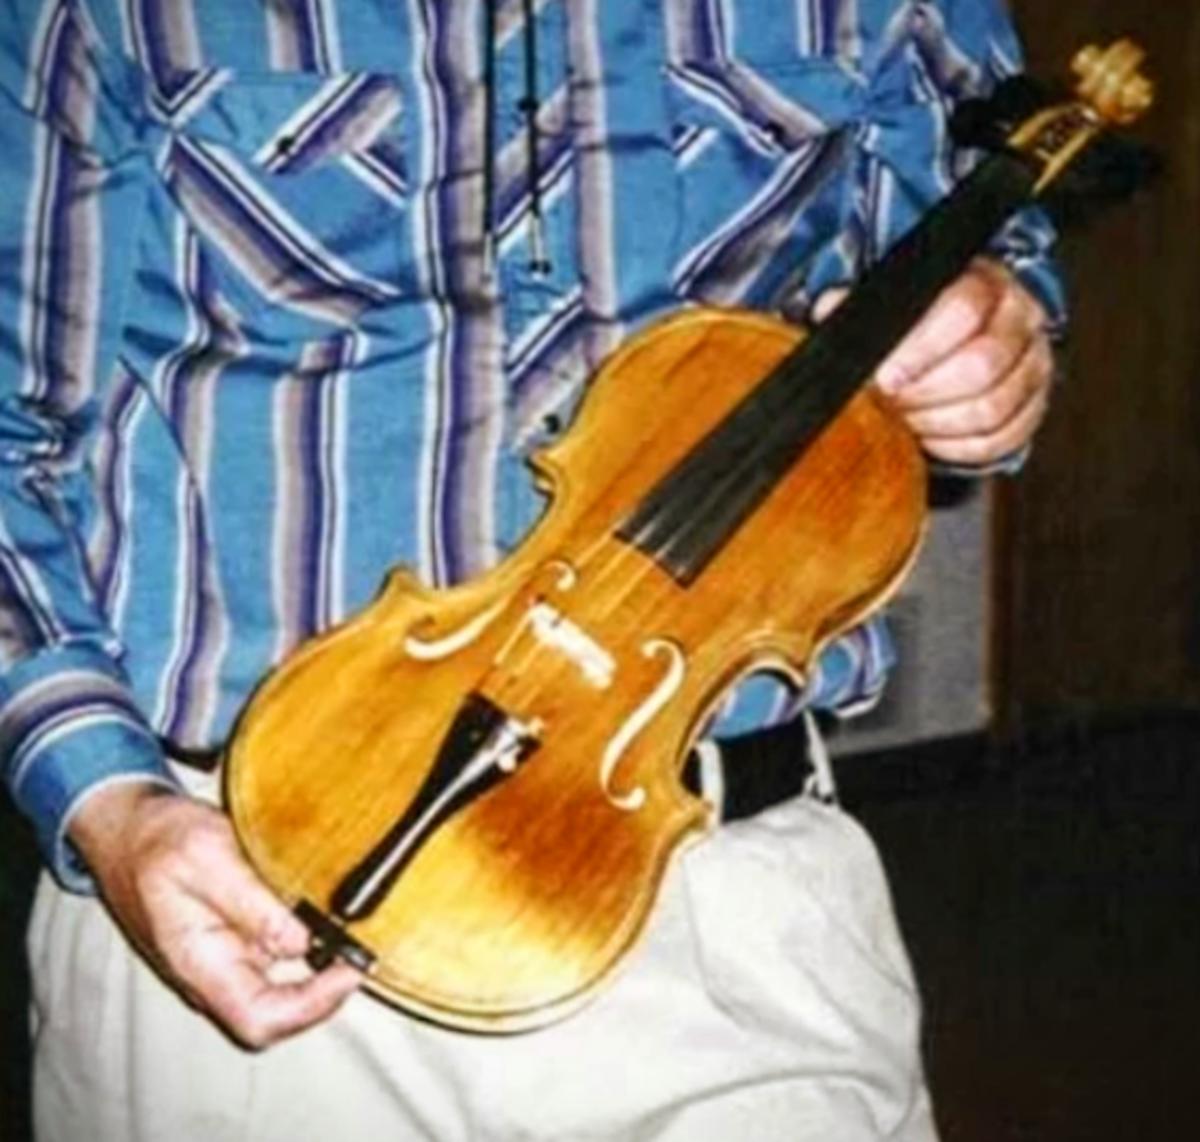 My Golden Fiddle: Homemade Violin